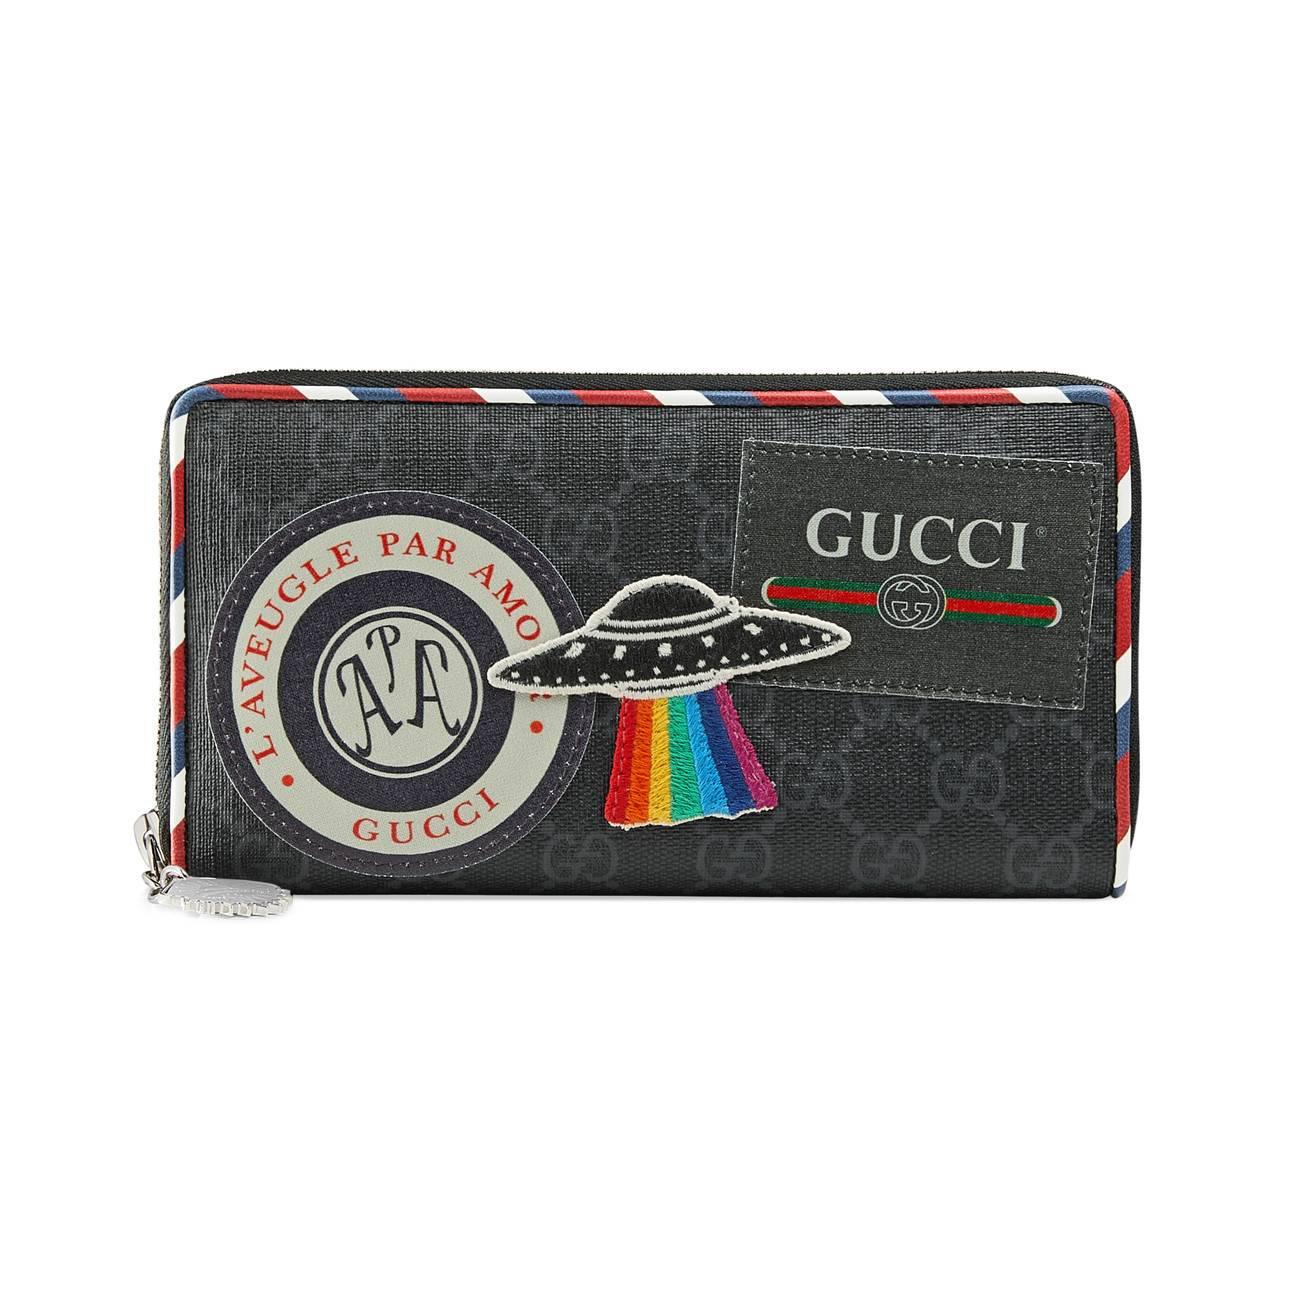 b1896c2ec705 Gucci - Black Night Courrier Gg Supreme Zip Around Wallet for Men - Lyst.  View fullscreen